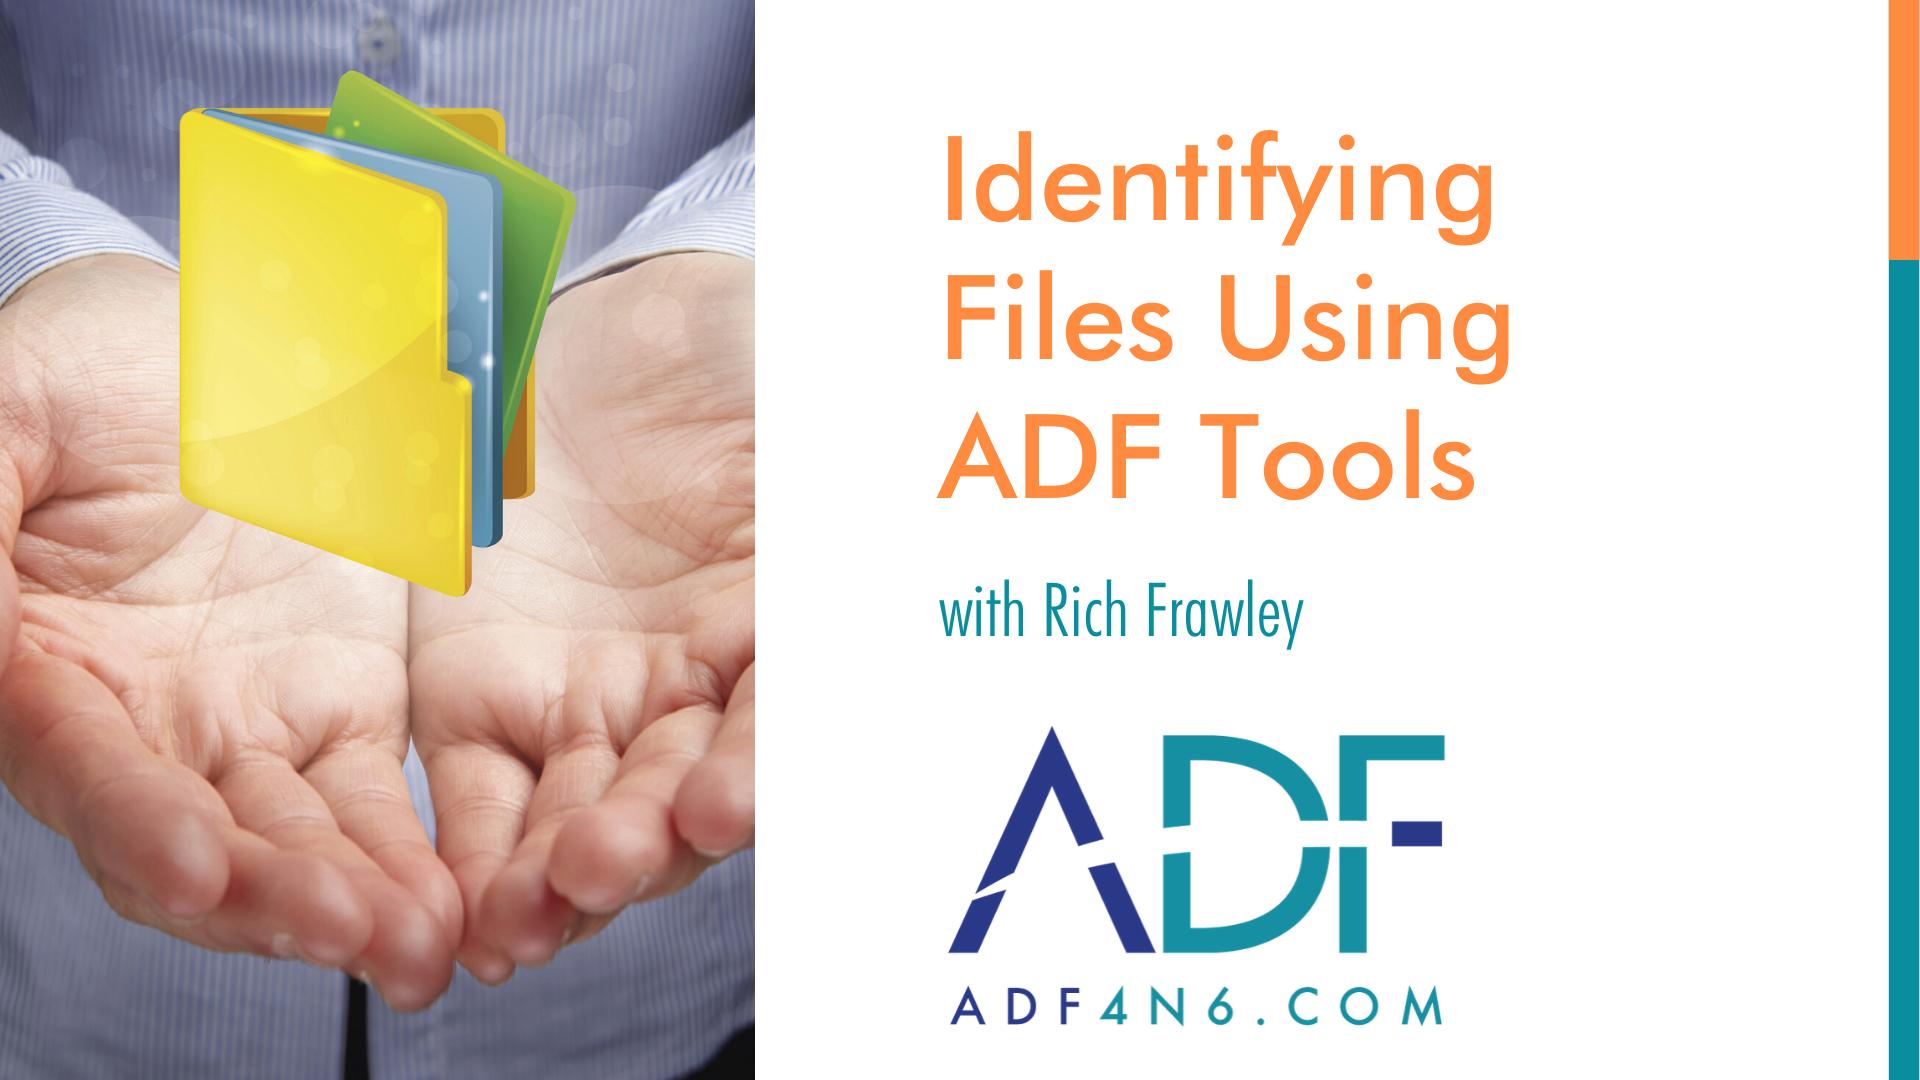 How ADF Tools Identify Files